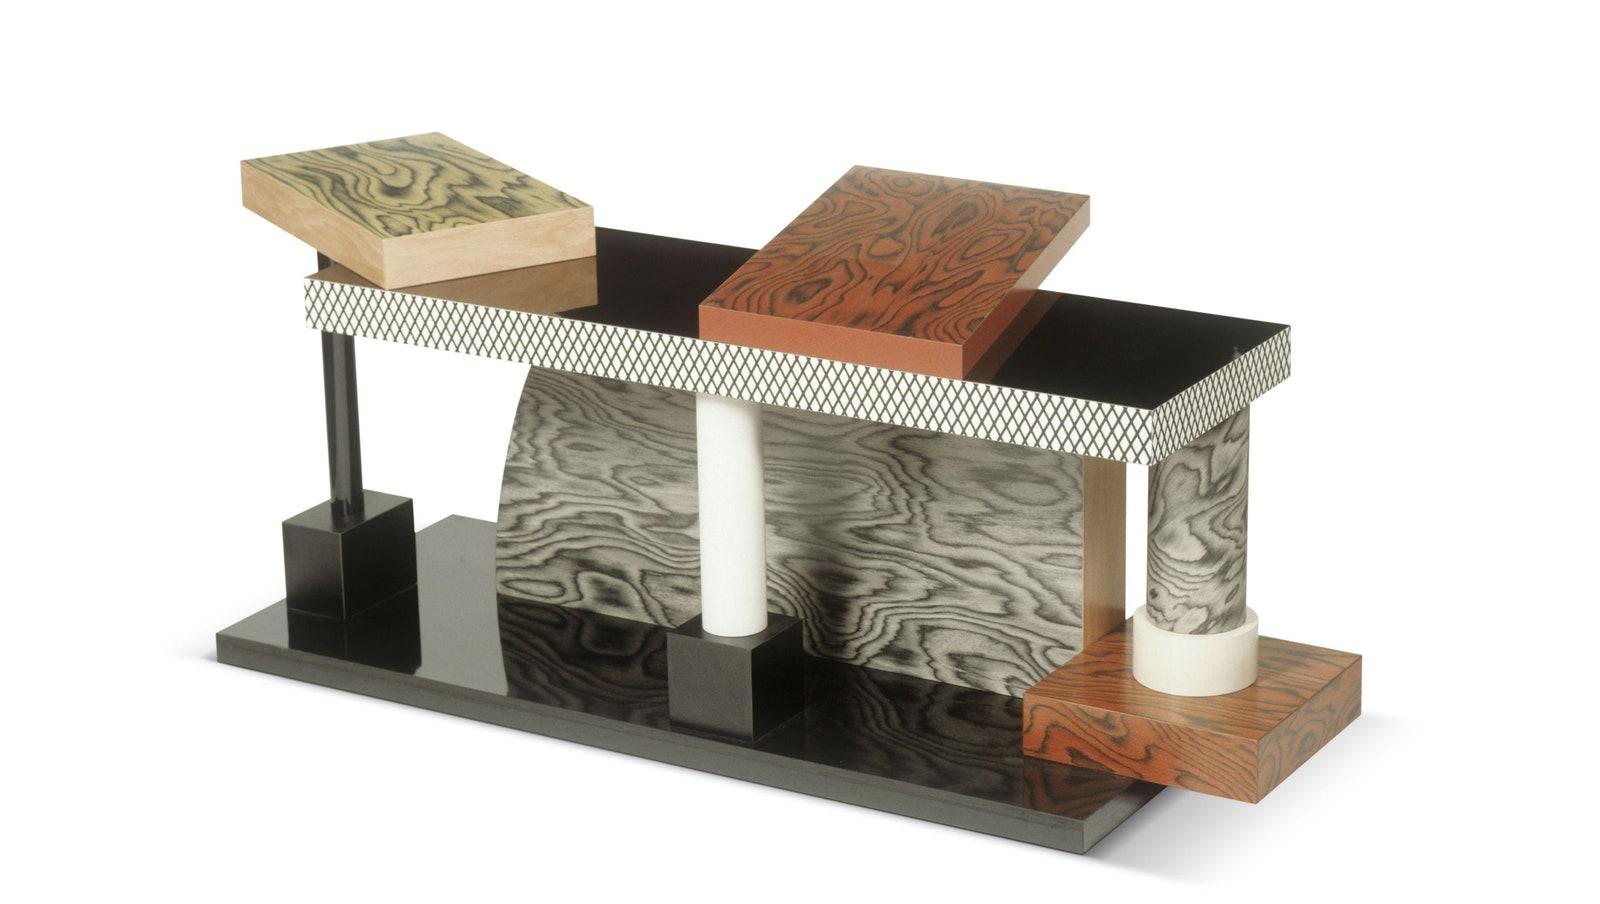 Ettore Sottsass table Tartar 1985  VG BildKunst Bonn 2021  Vitra Design Museum photo Andreas Jung